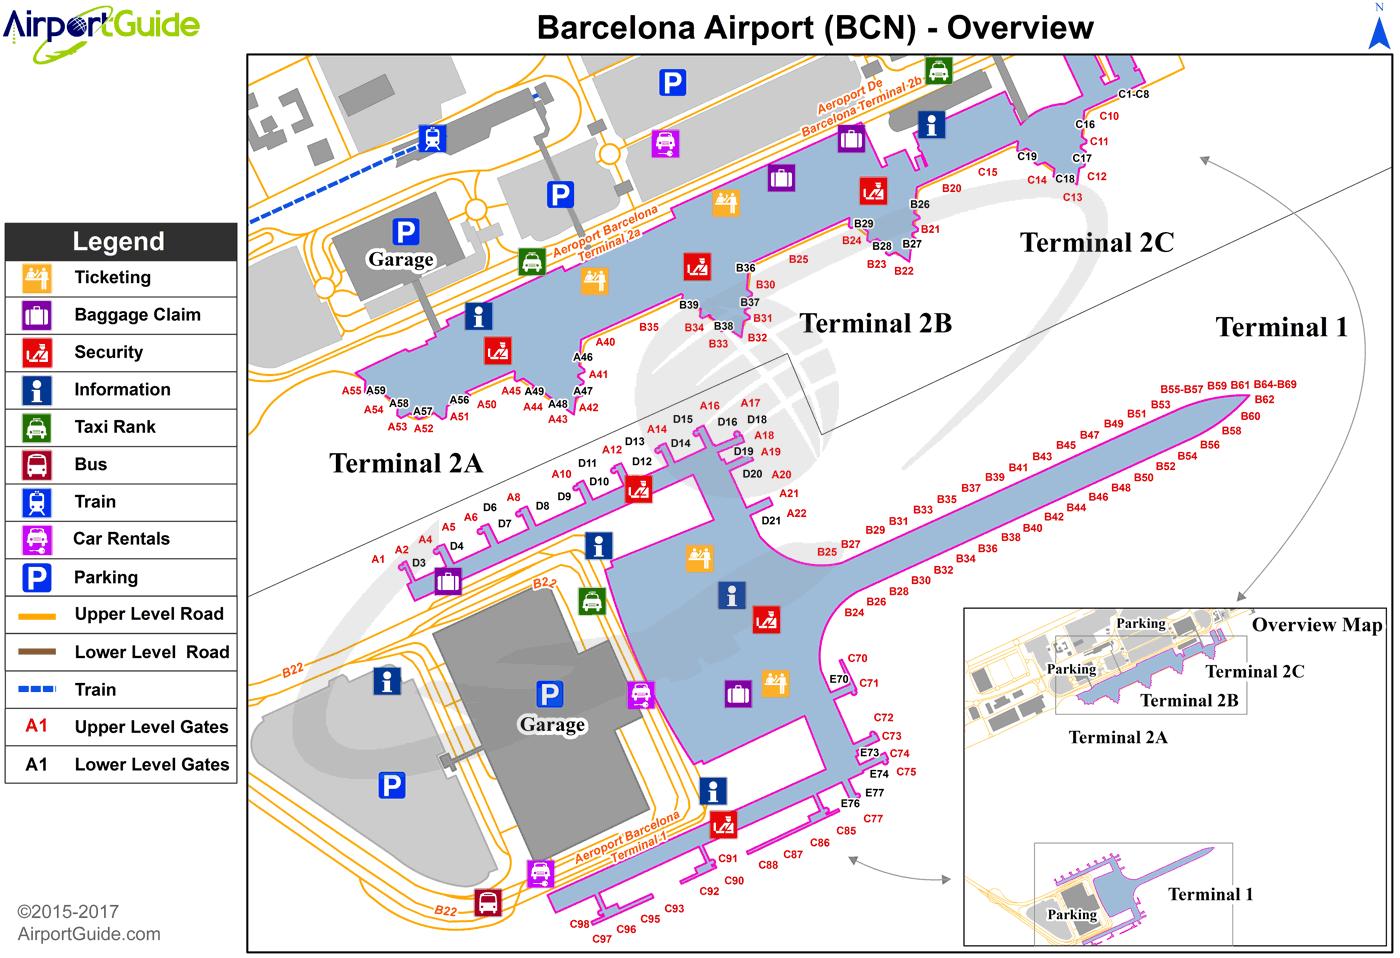 Barcelona Airport Map Barcelona Airport Map | compressportnederland Barcelona Airport Map